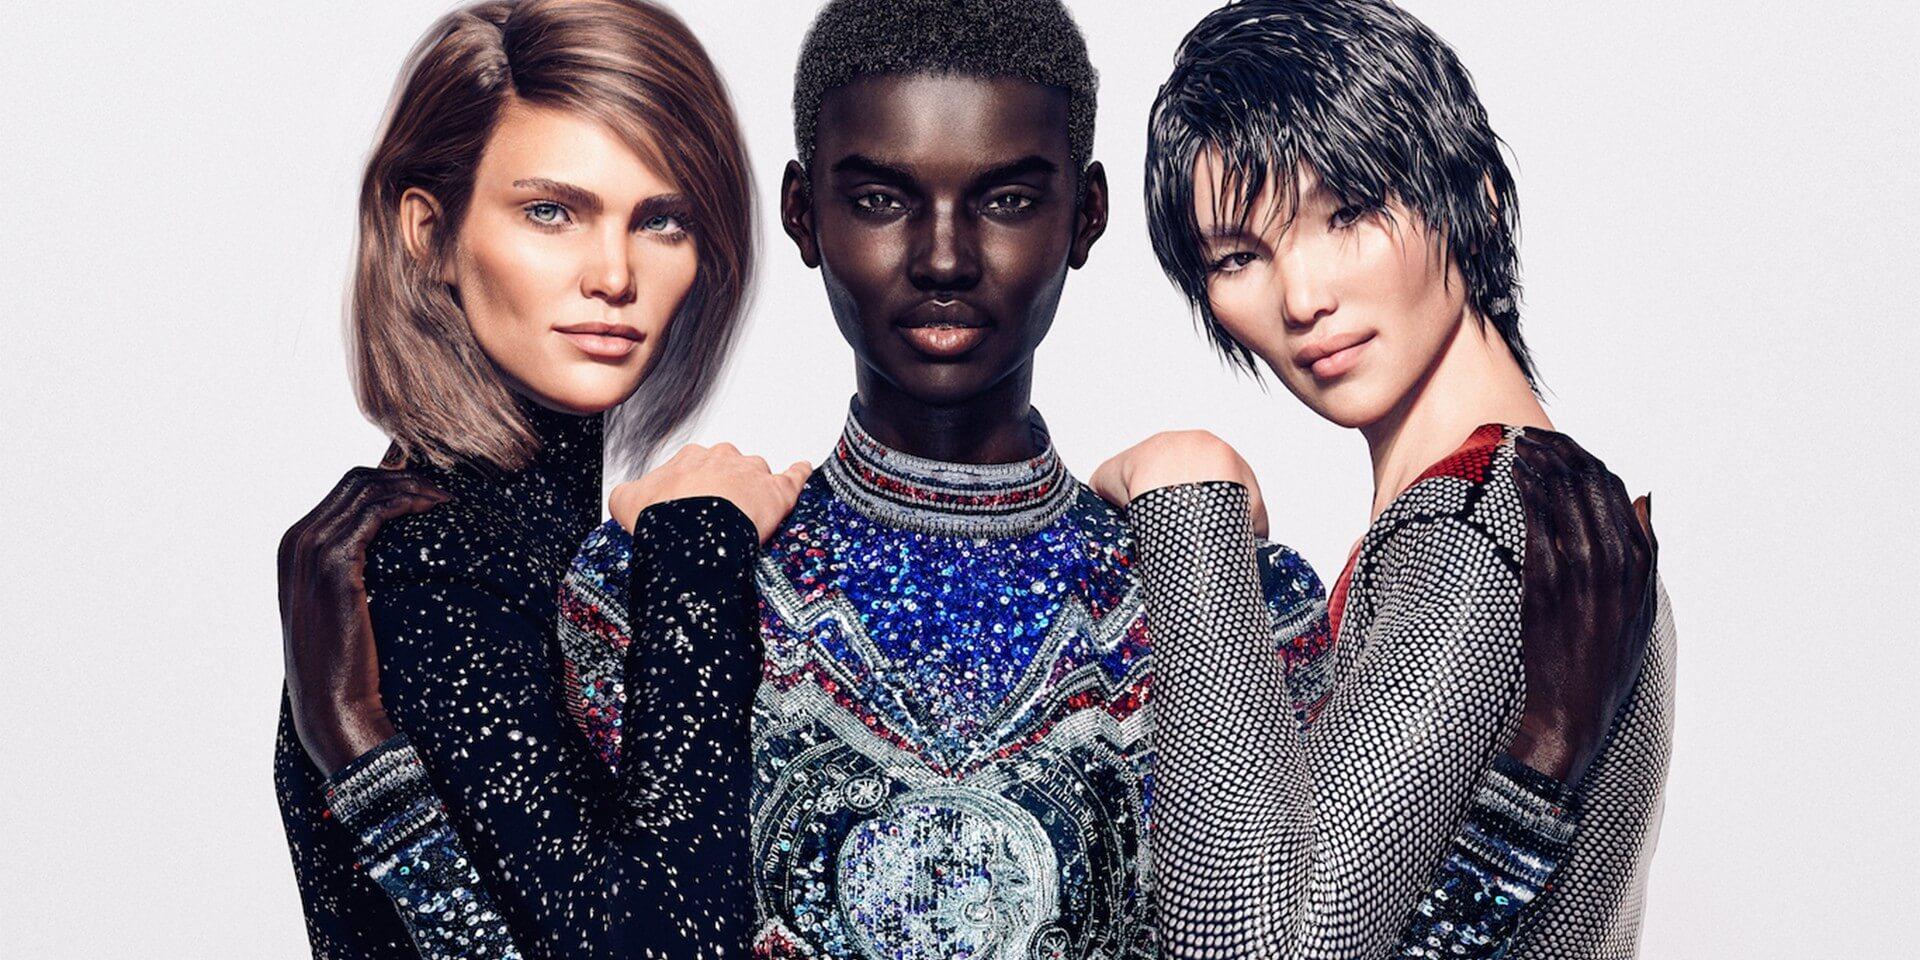 virtual-models-in-fashion-balmain